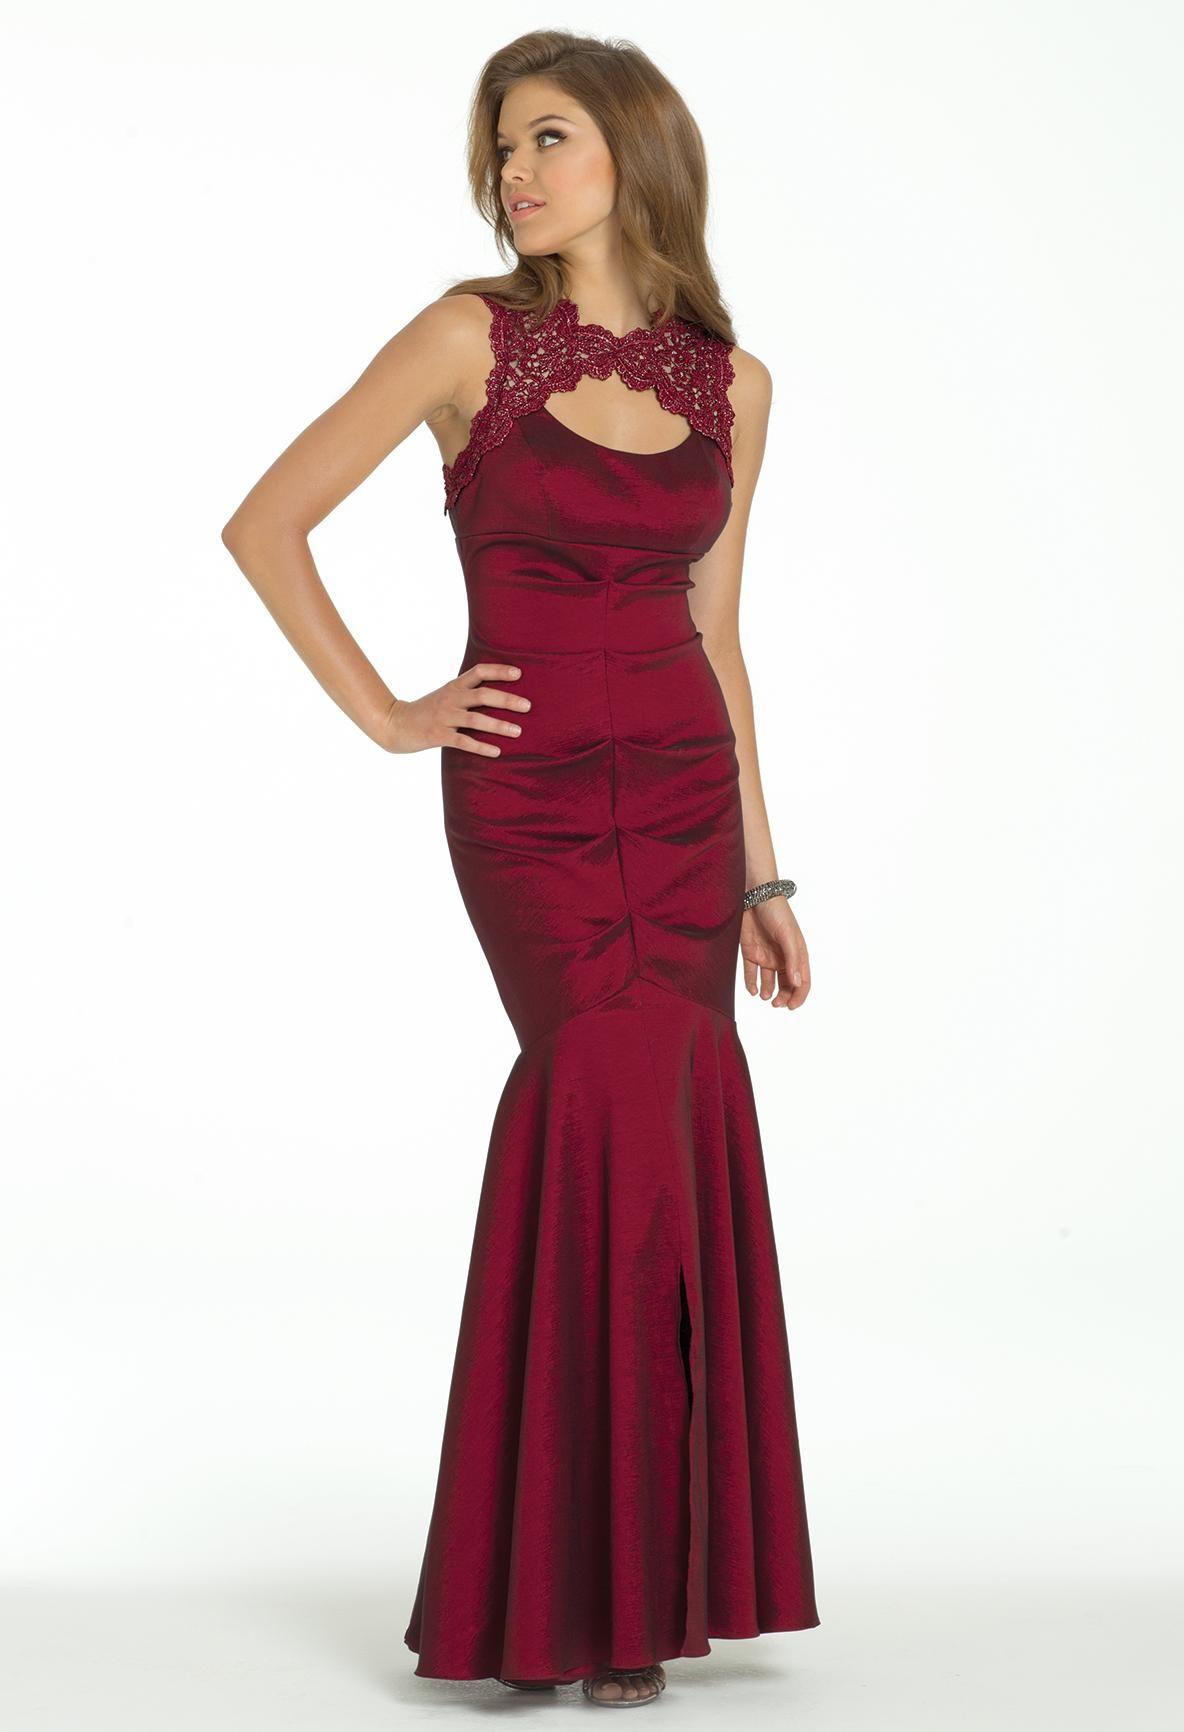 Metallic lace prom dress camillelavie clvprom prom dresses long